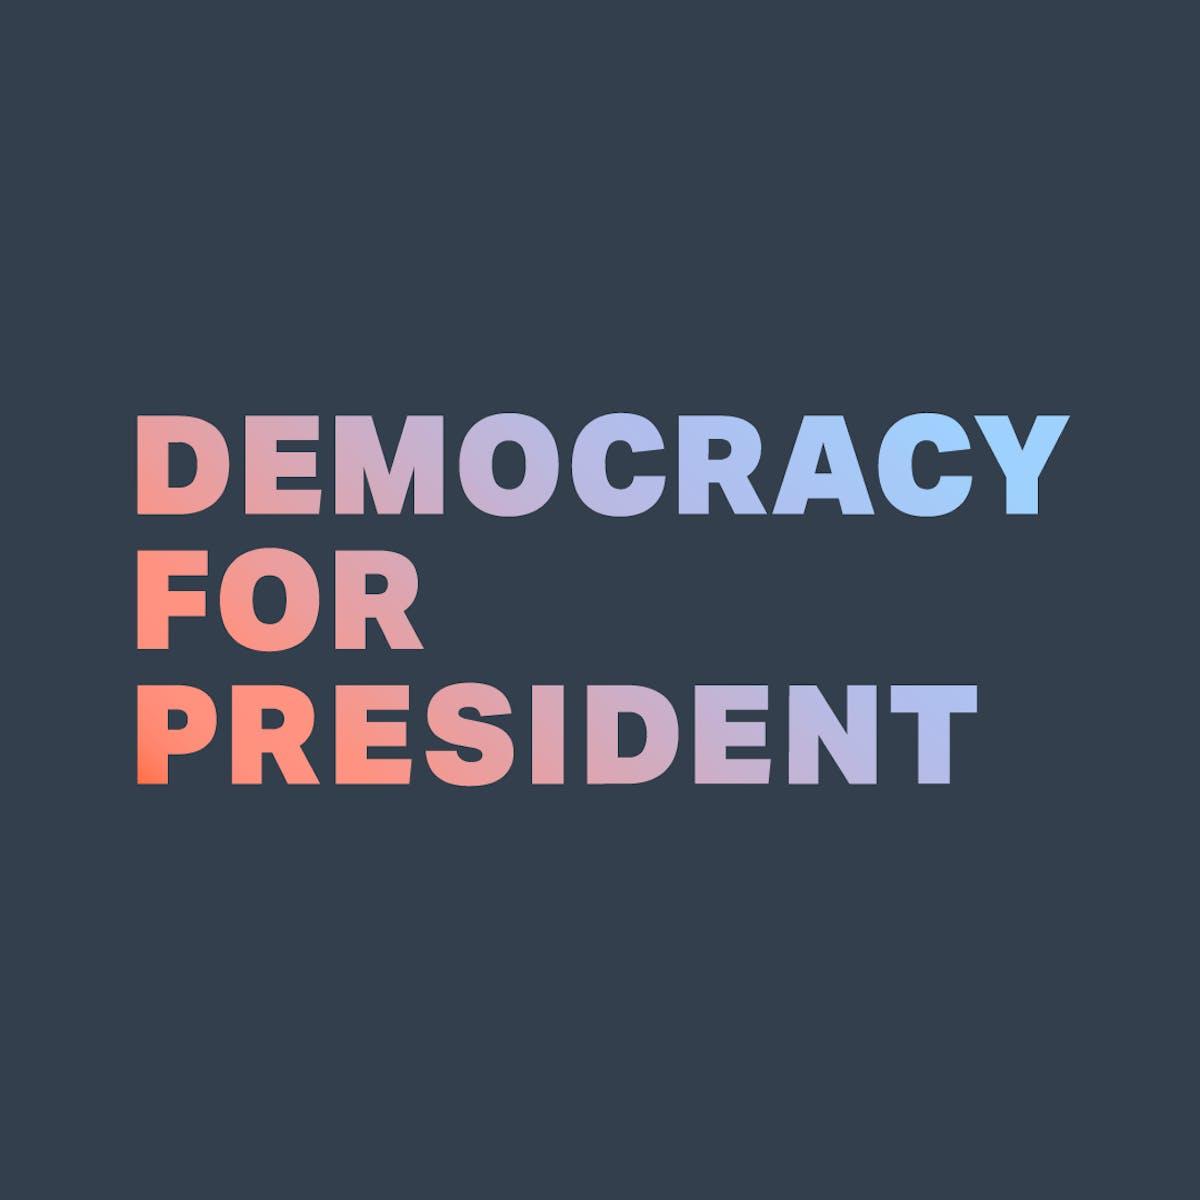 Democracy for President